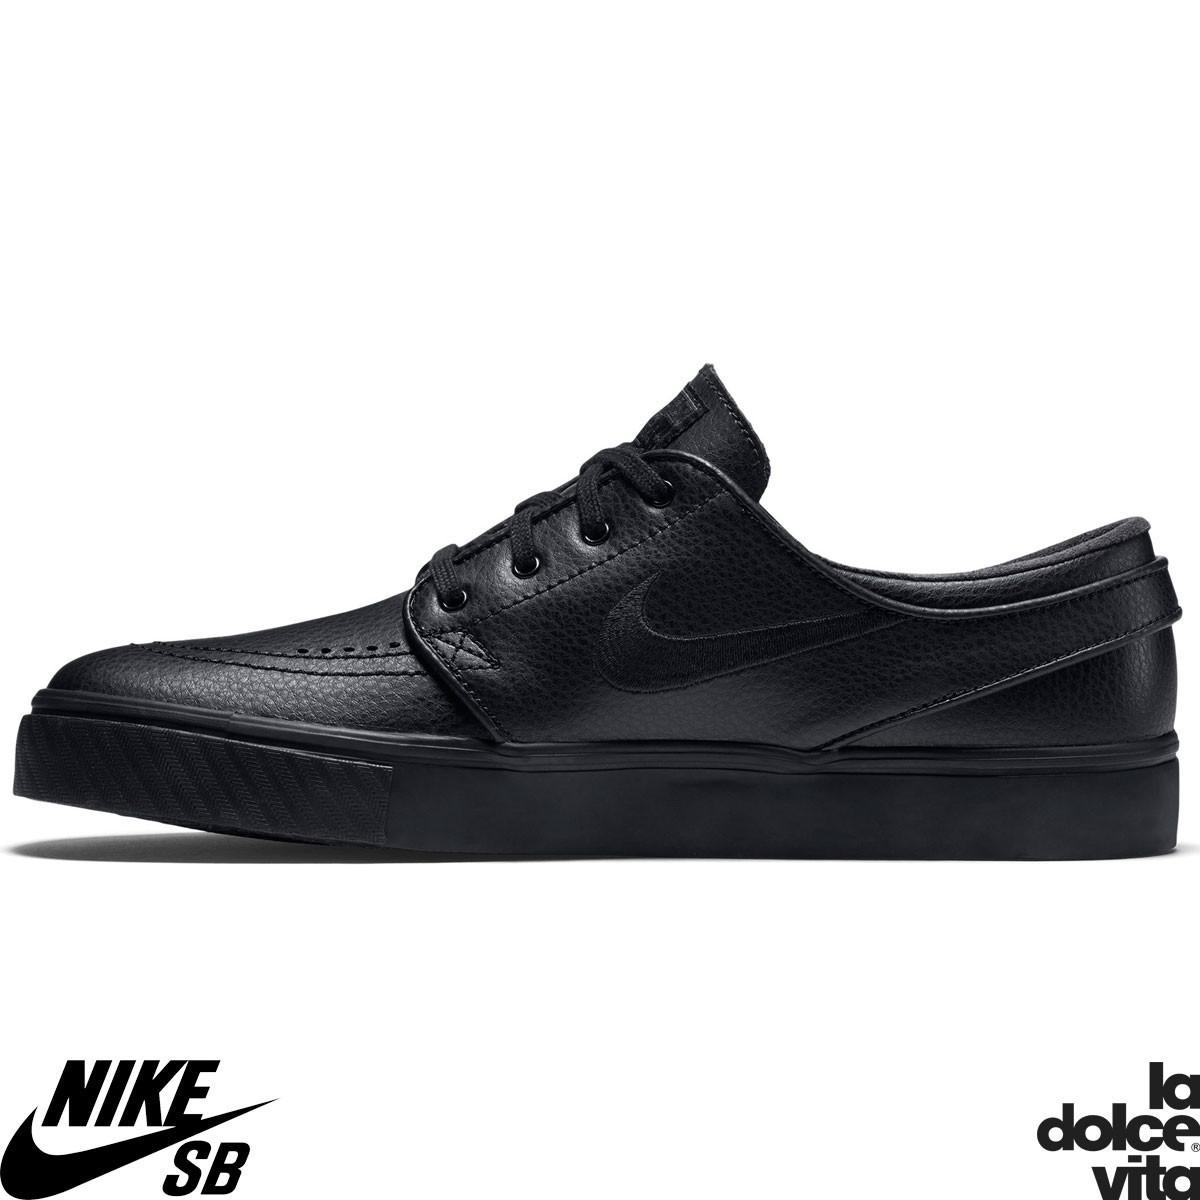 Chaussures Skate Nike SB Noir Stefan Janoski Zoom Noir SB Leather 1adf50